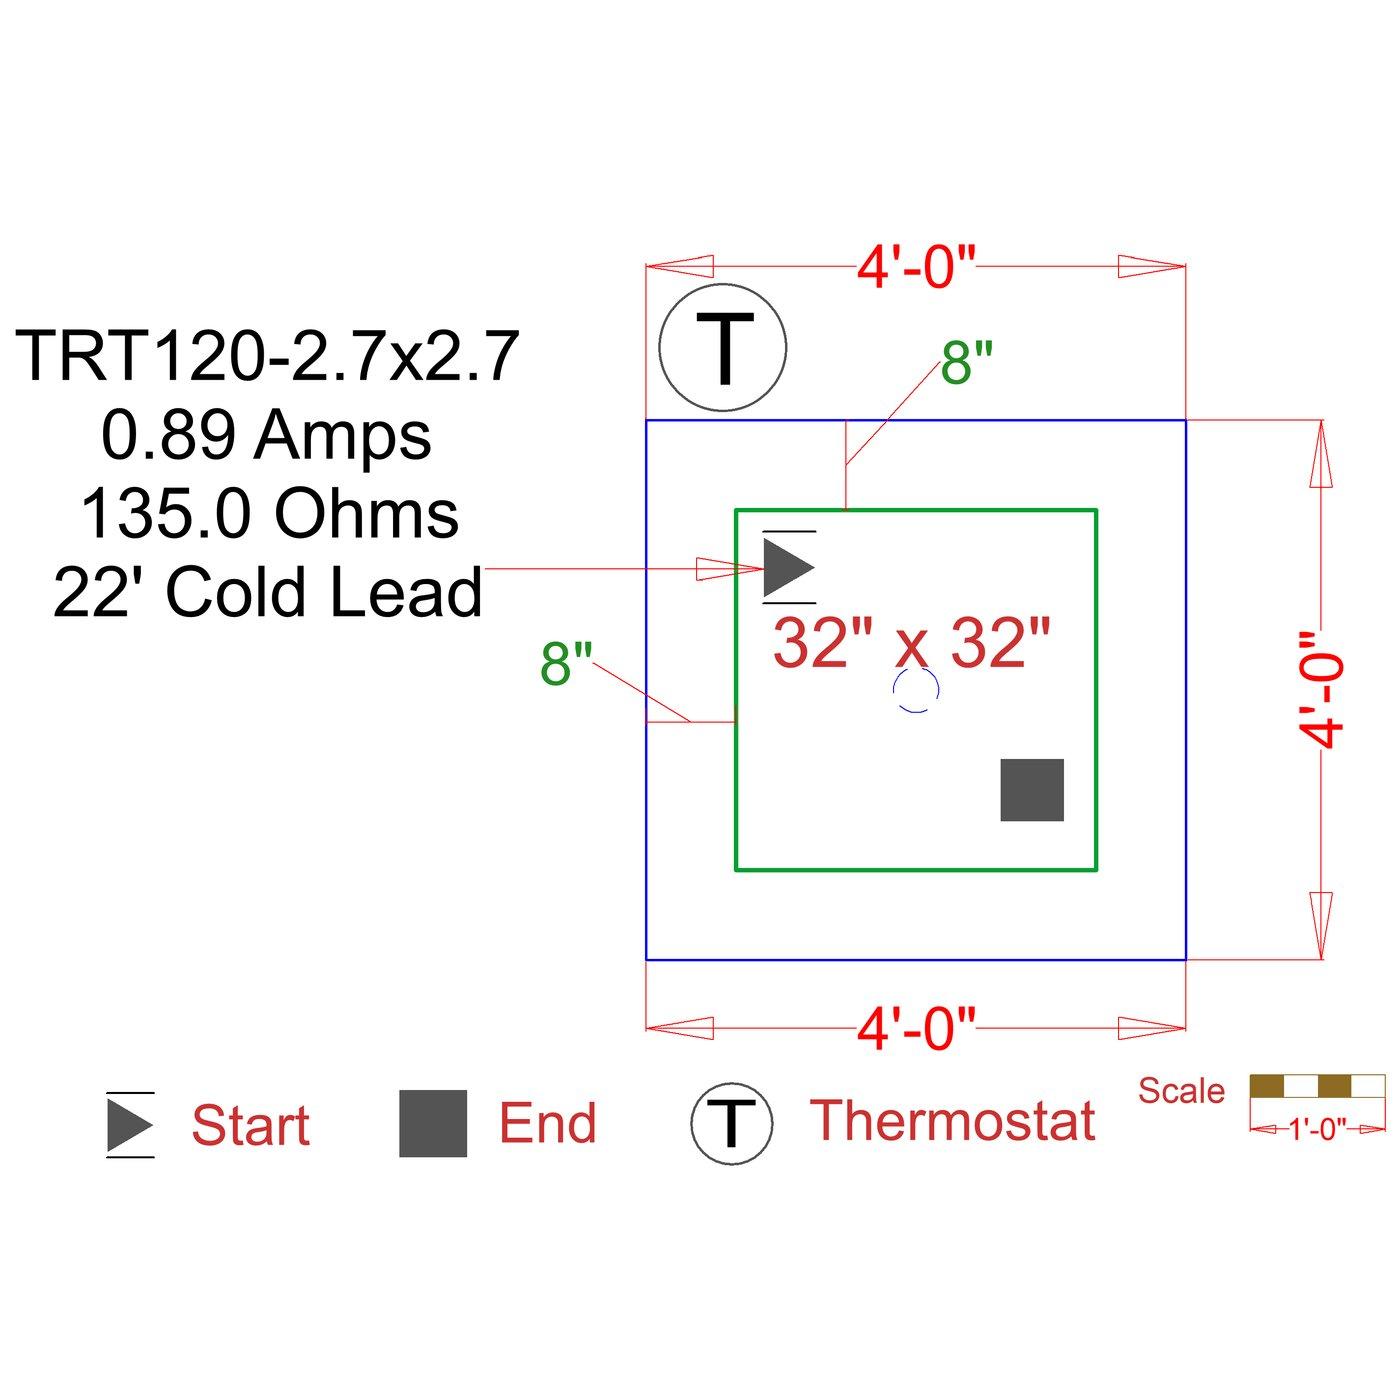 Magnificent True T 72f Wiring Diagram Ideas - Wiring Diagram Ideas ...